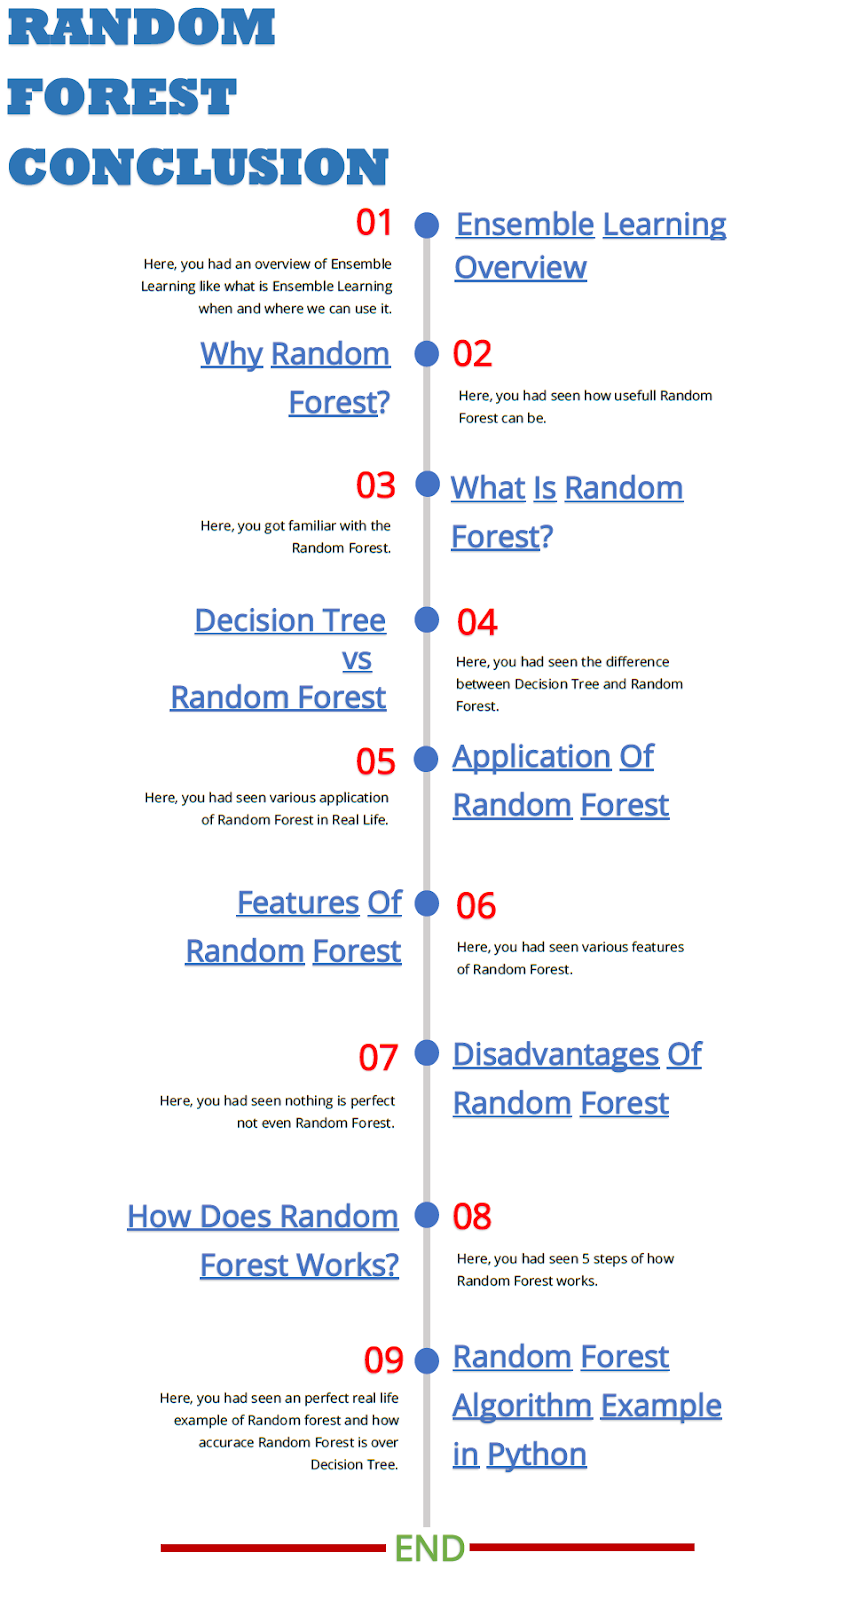 Random Forest Conclusion